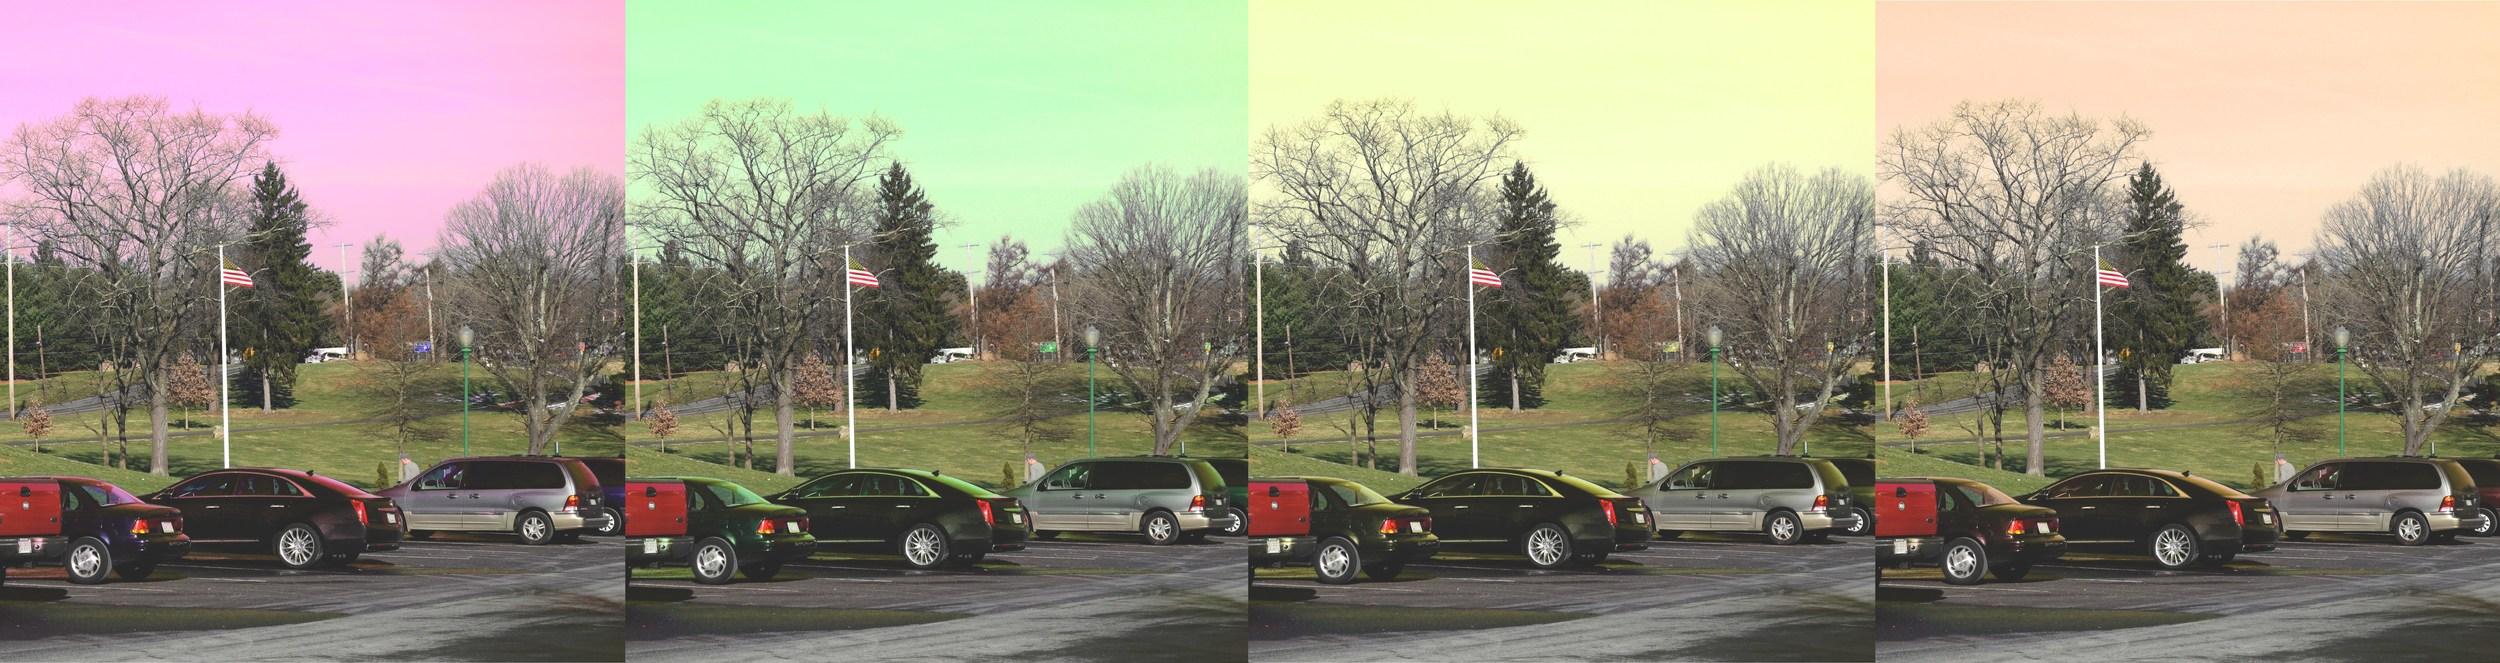 parking_lot_4_small.jpg